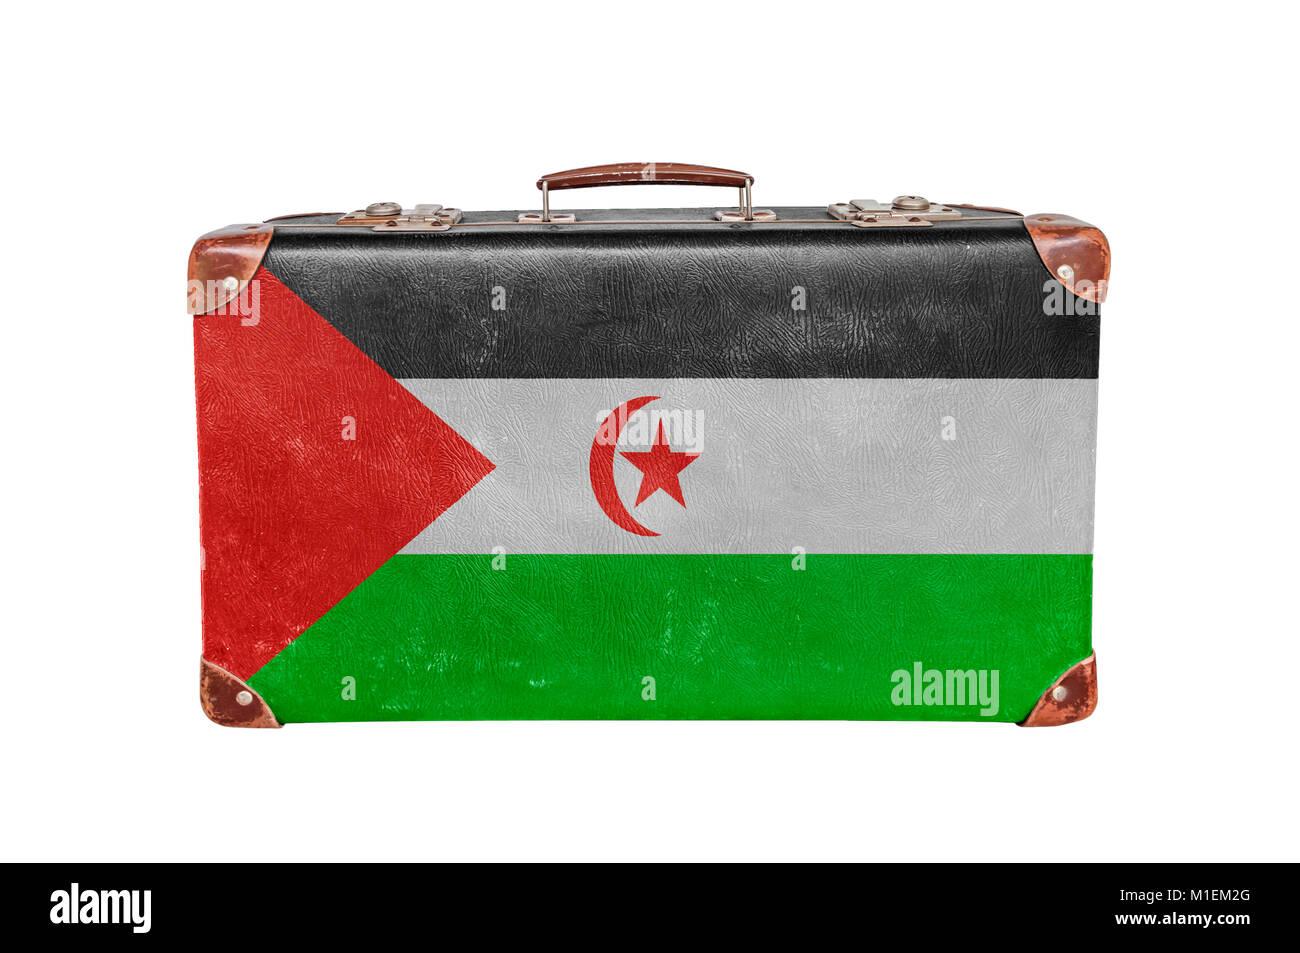 Vintage suitcase with Sahrawi Arab Democratic Republic flag - Stock Image